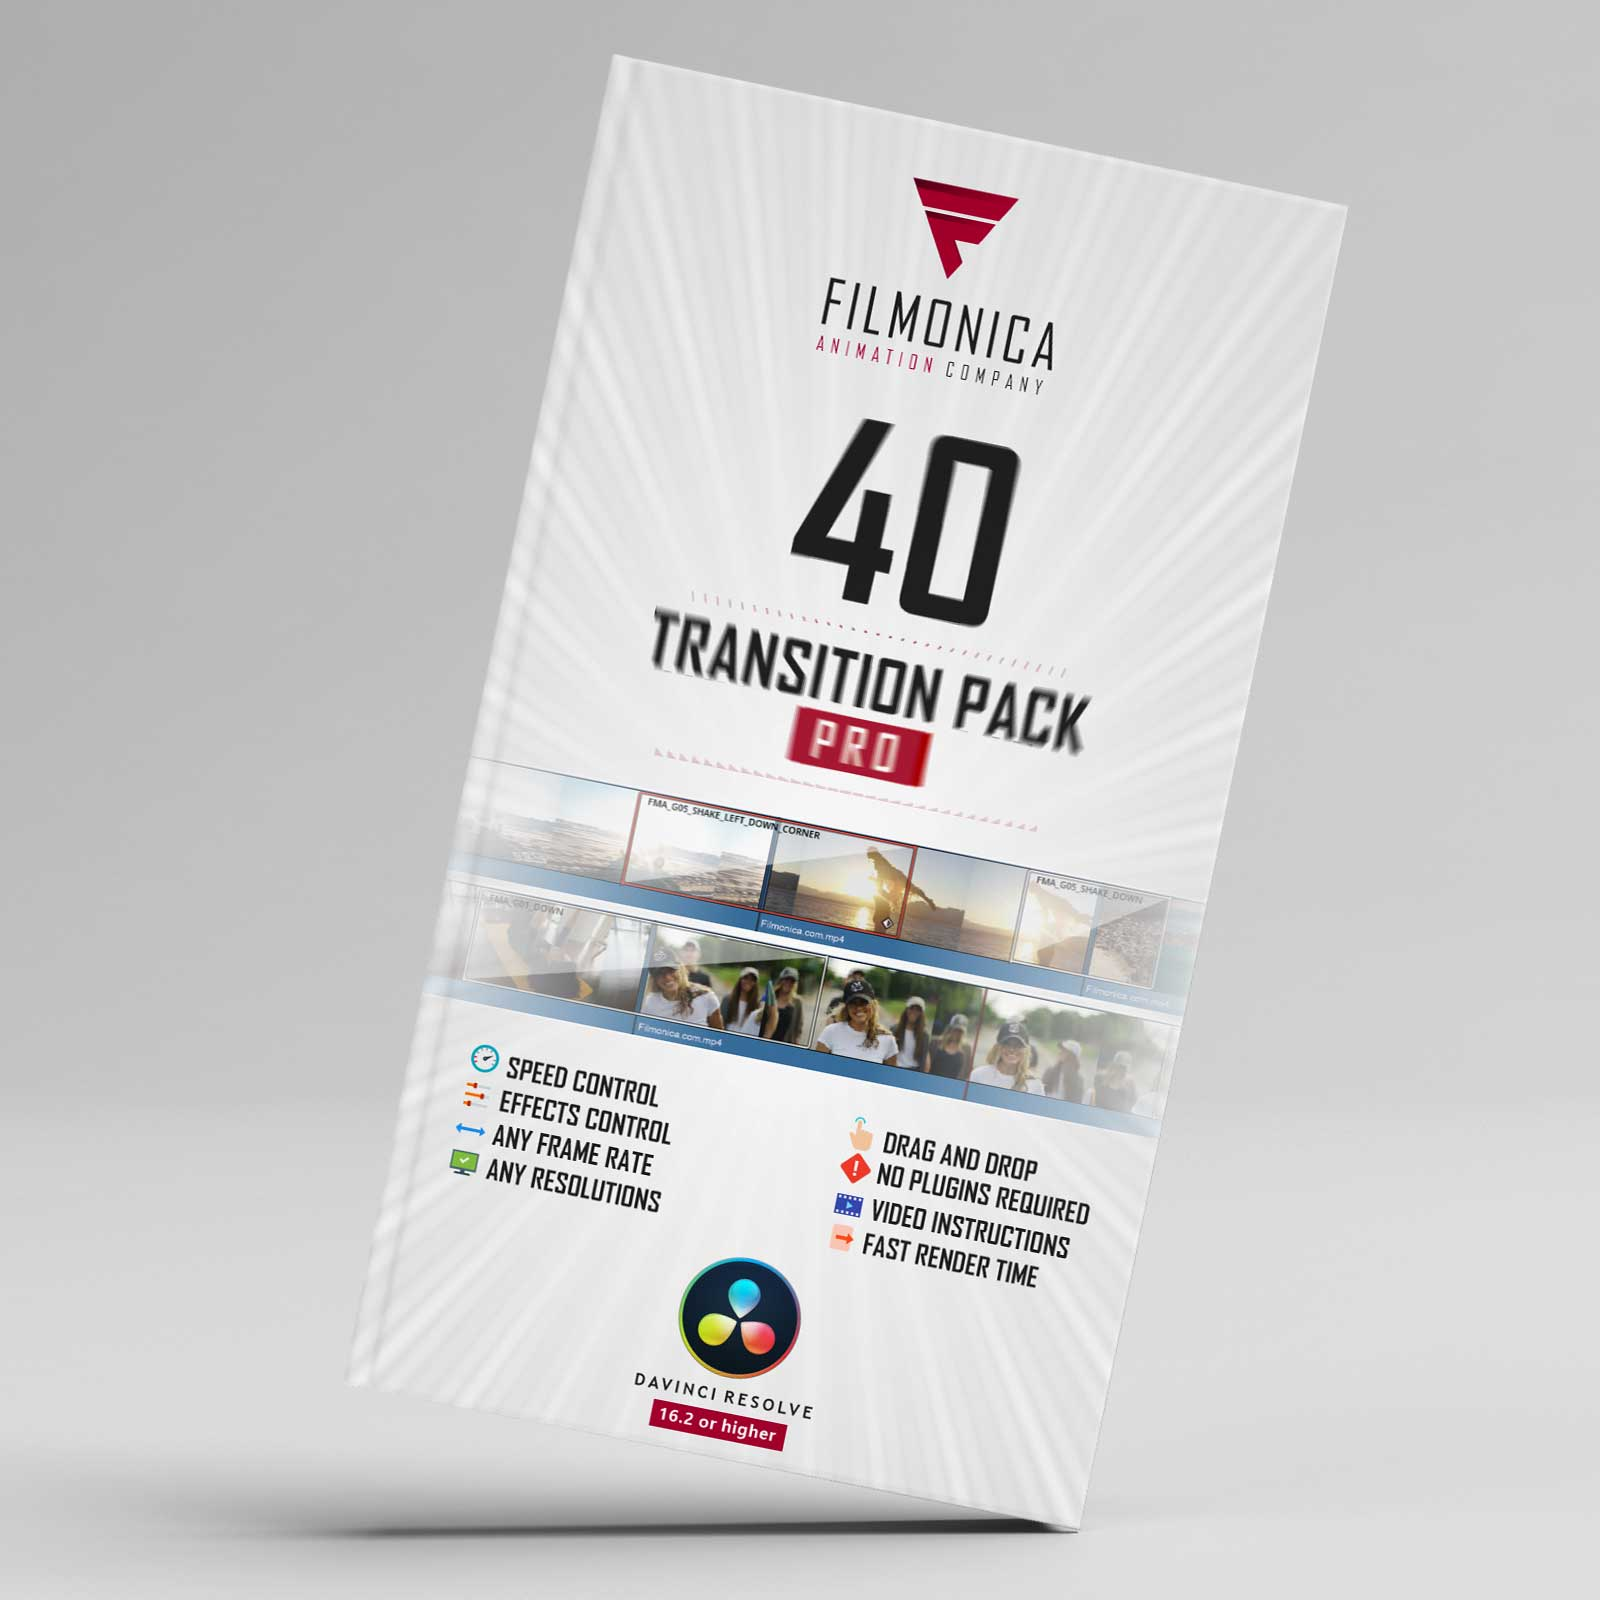 دانلود 40 ترنزیشن داوینچی ریزالو 40+ Transitions Pack for DaVinci Resolve!